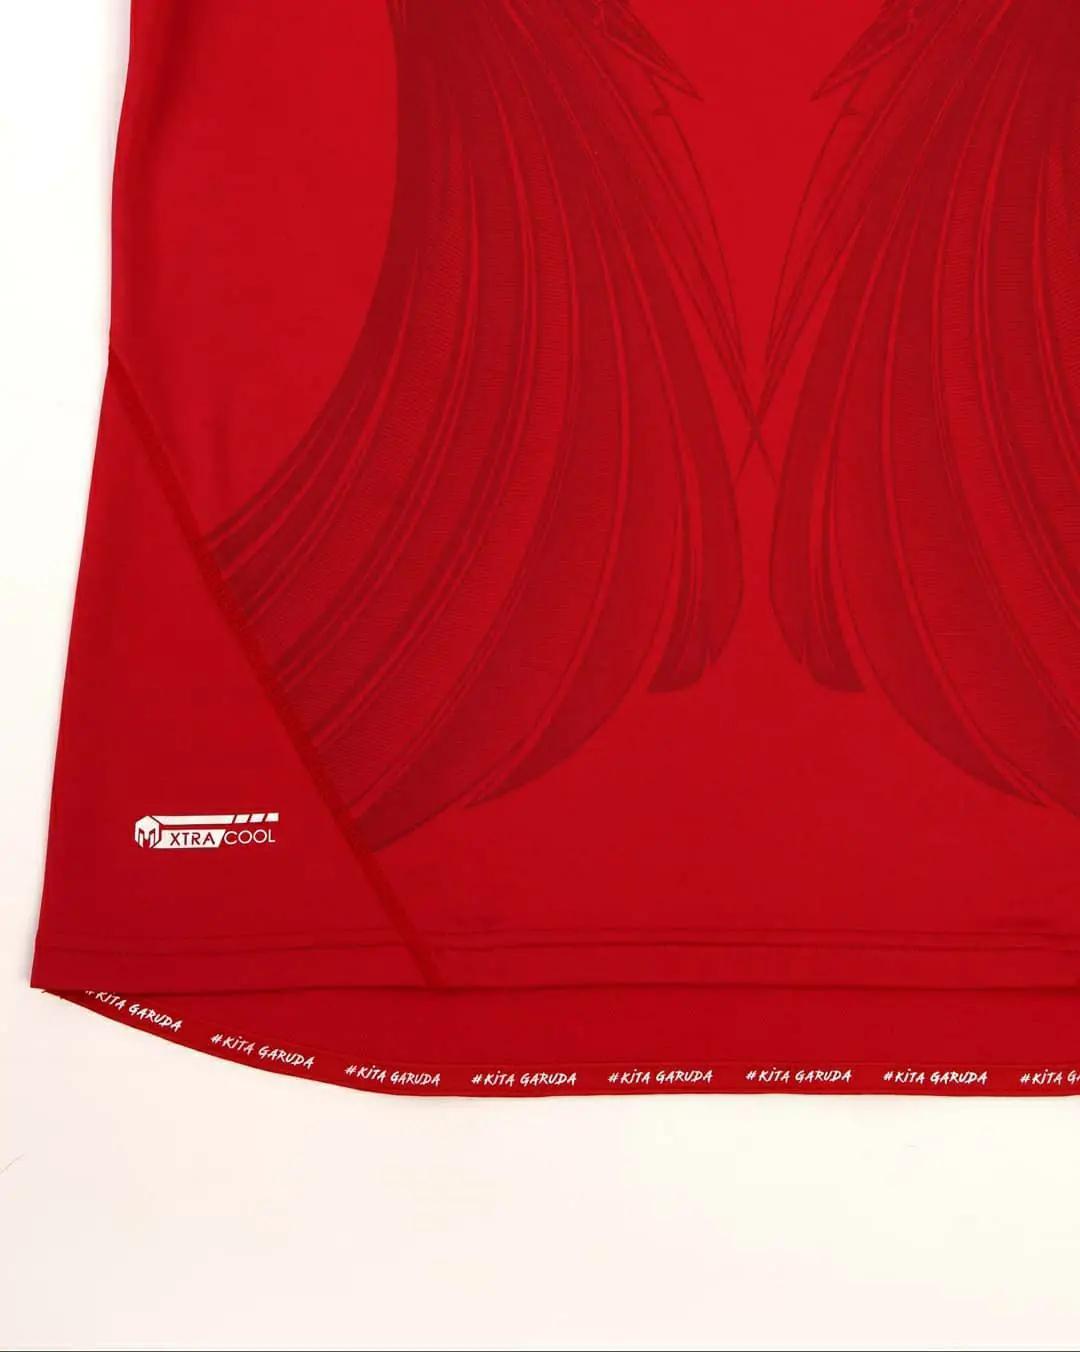 detail Jersey timnas Indonesia 2020 x mills